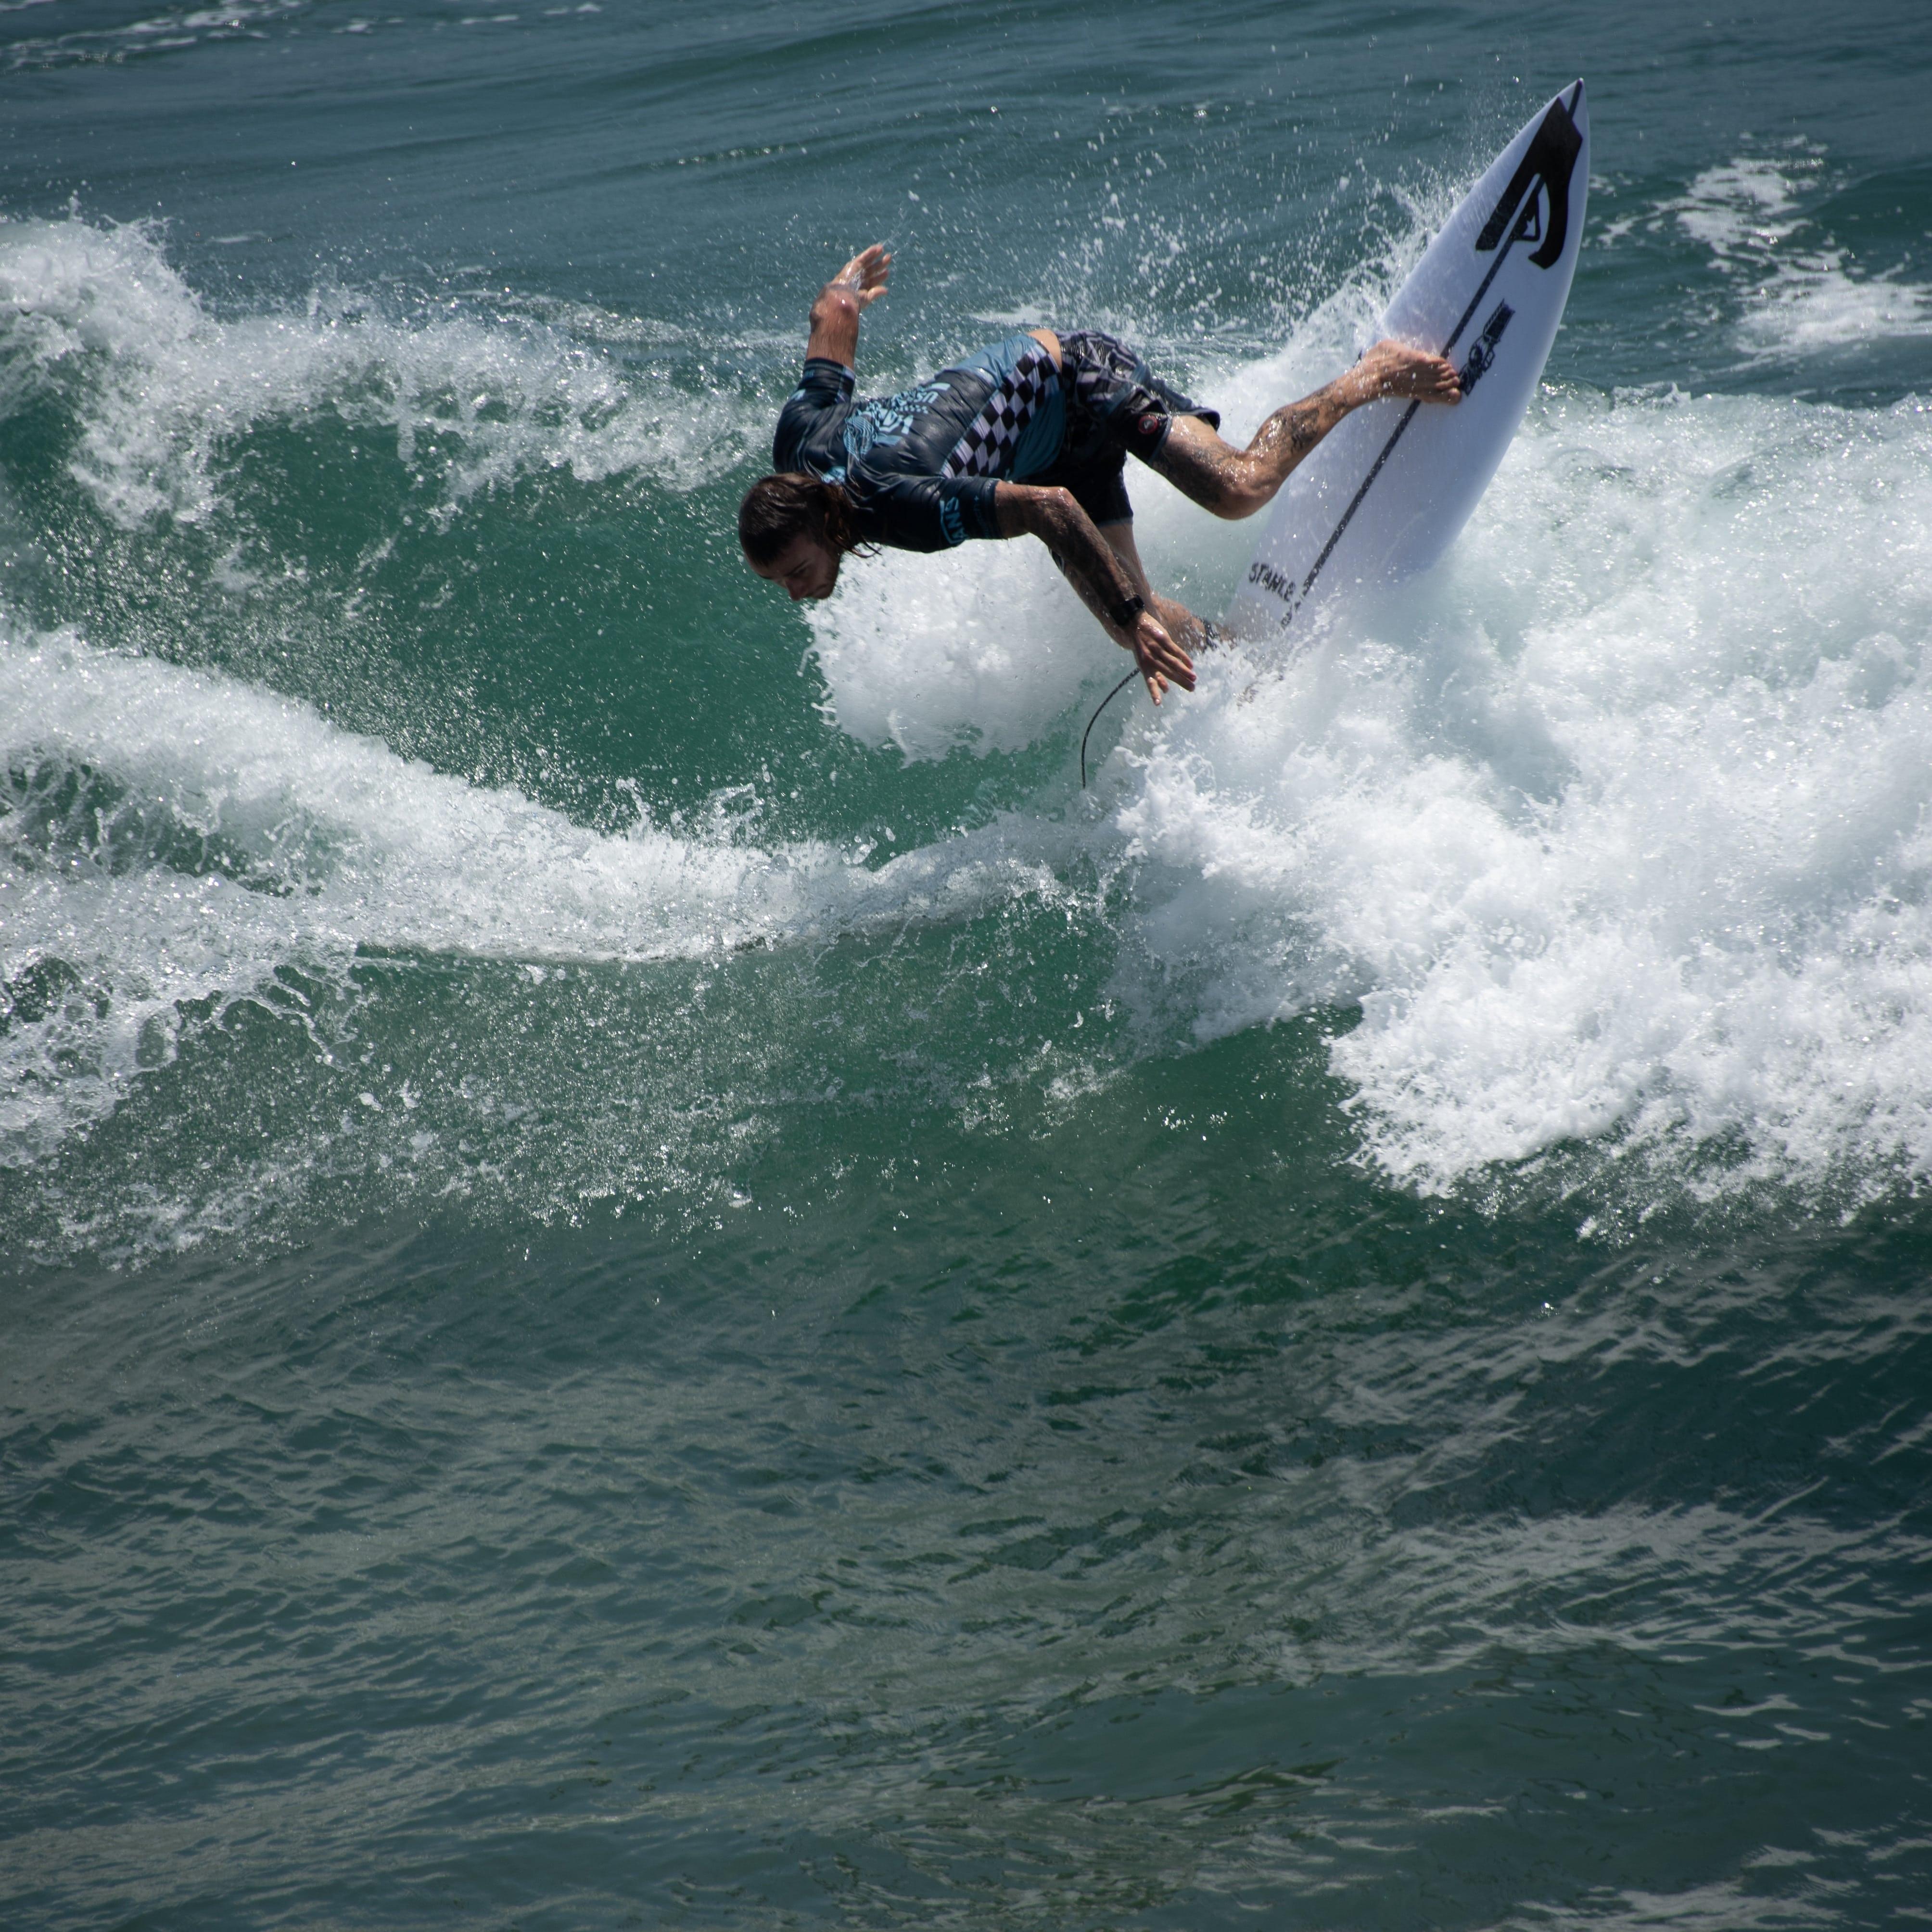 surf snowdonia pods, surf snowdonia crash and splash, surf snowdonia opening times, surf snowdonia cost, surf snowdonia how it works, surf snowdonia voucher, surf snowdonia review